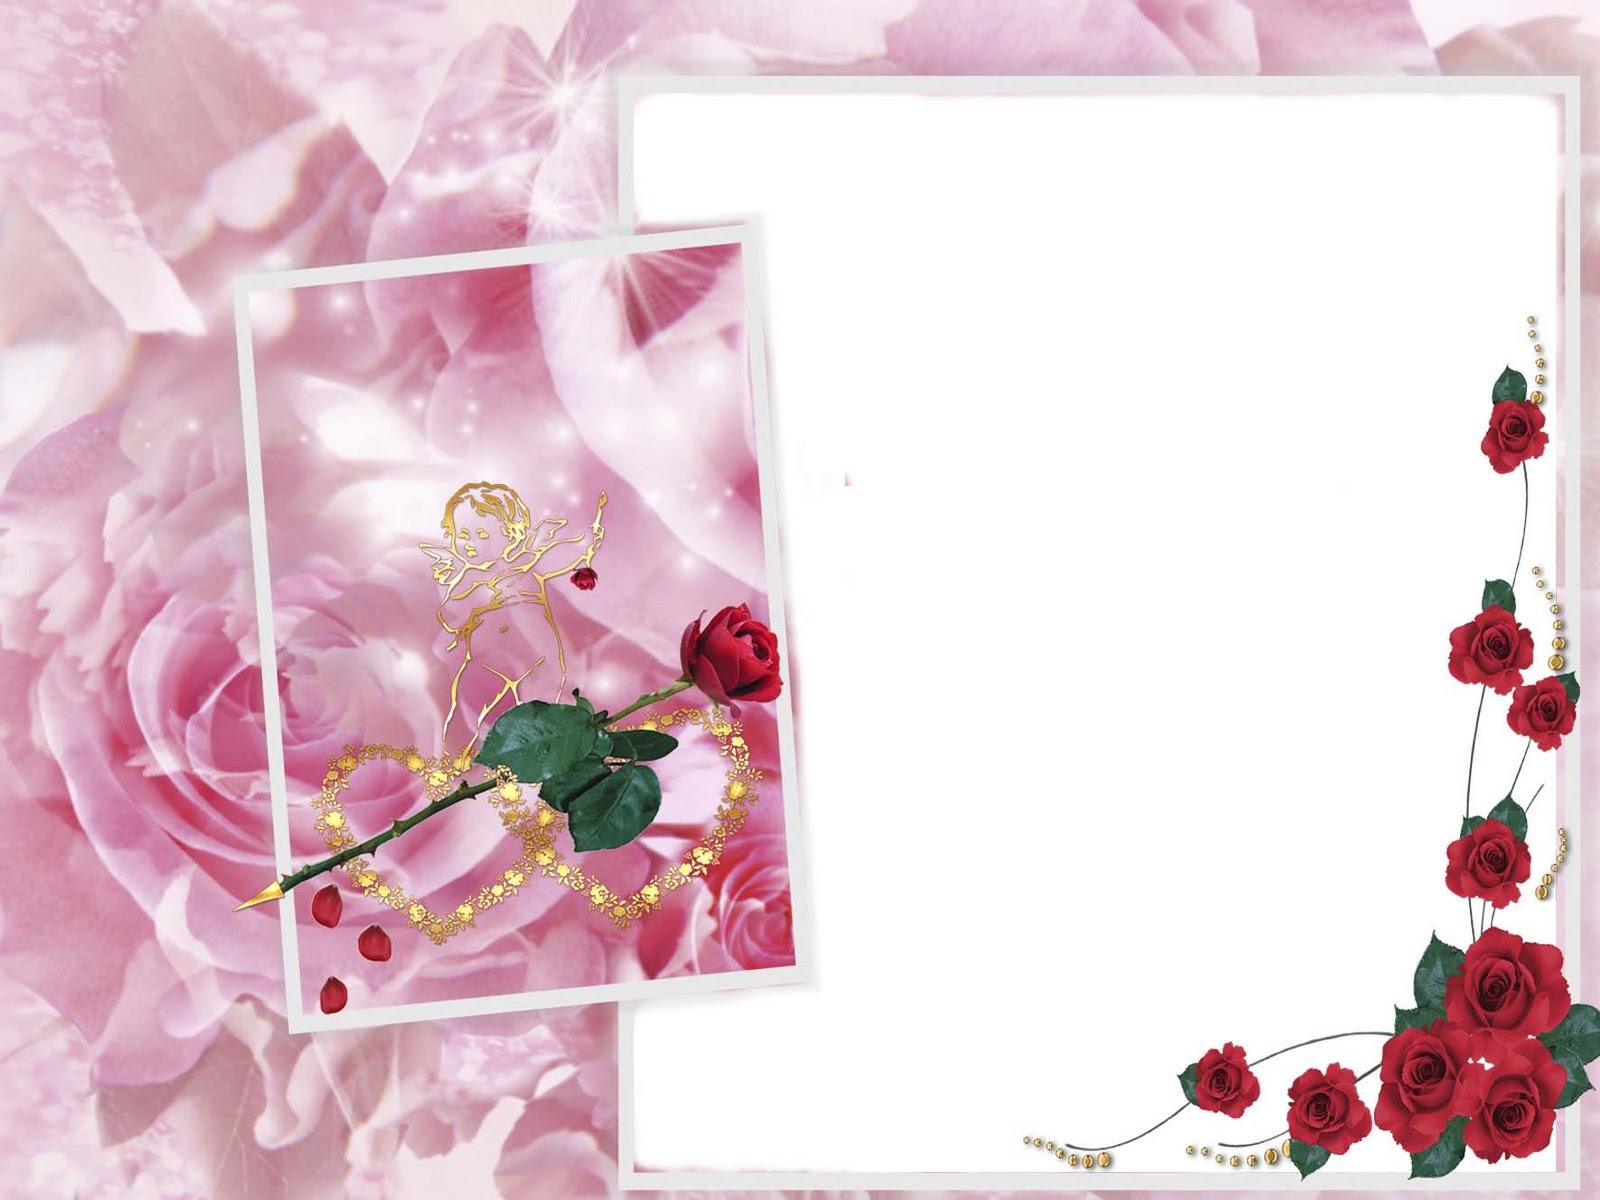 Фотошоп онлайн для создания открыток